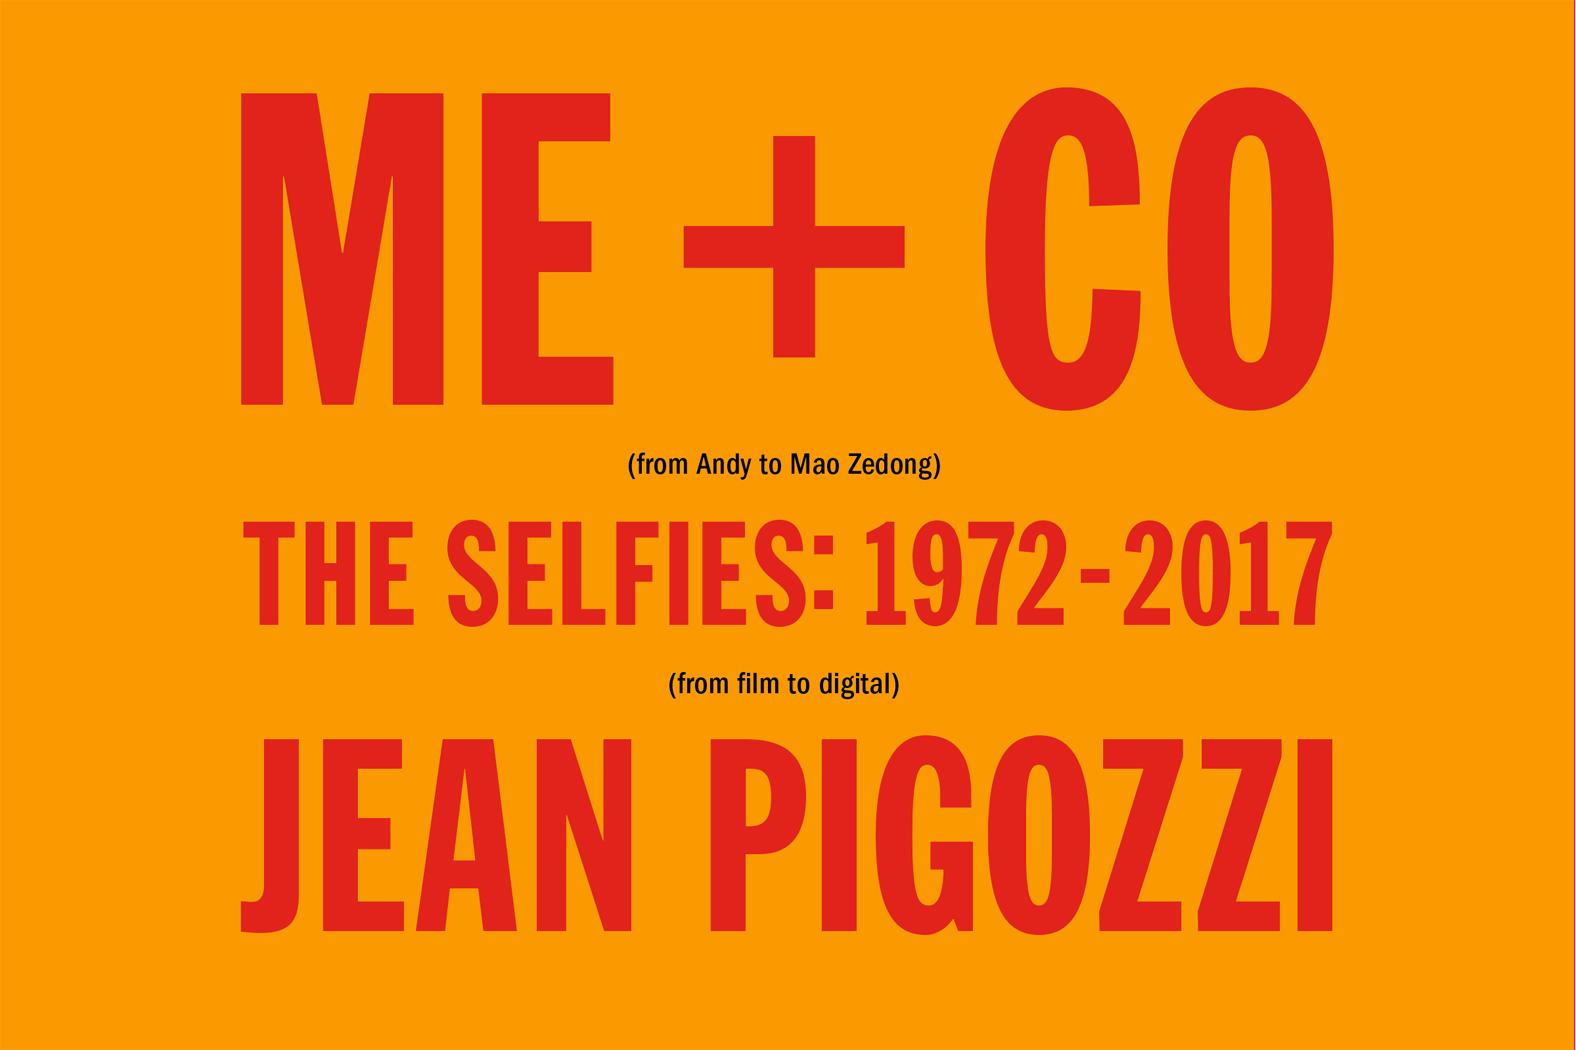 Jean Pigozzi